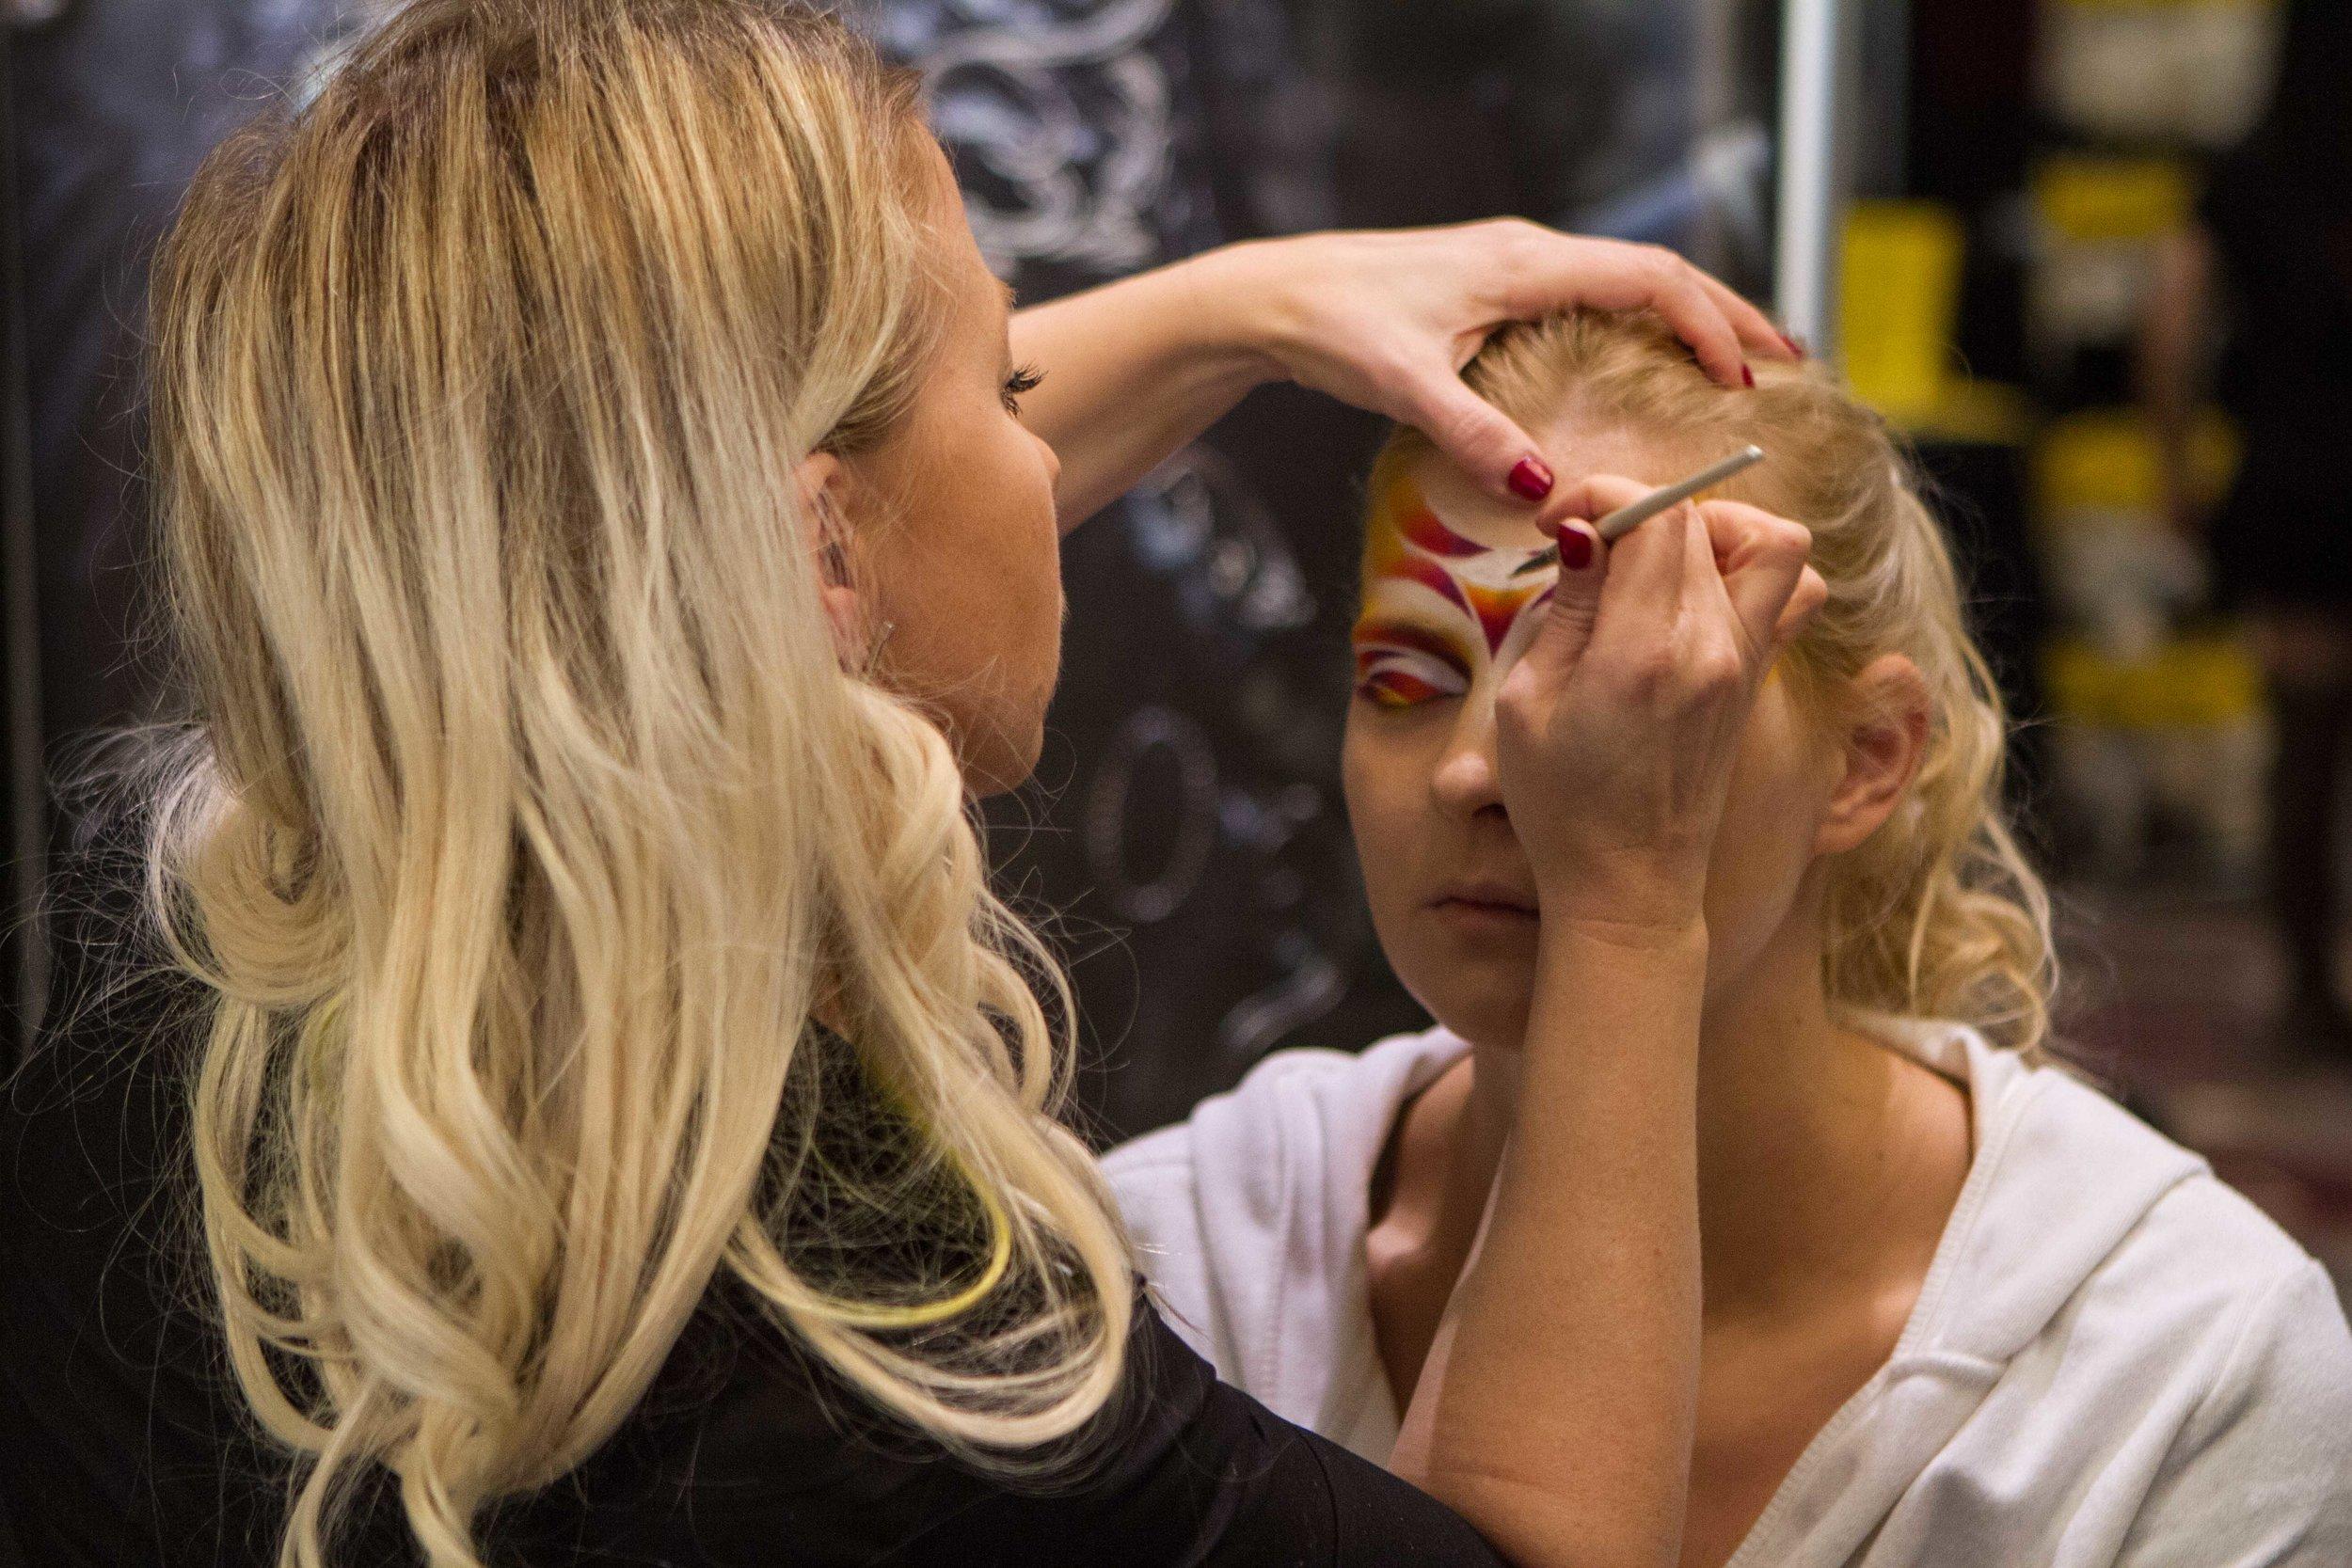 IMATS 2017 - Kristina Asztalos Beauty SFX (www.KyleReaArt.com - www.KyleReaPhotography.com) 5.jpg